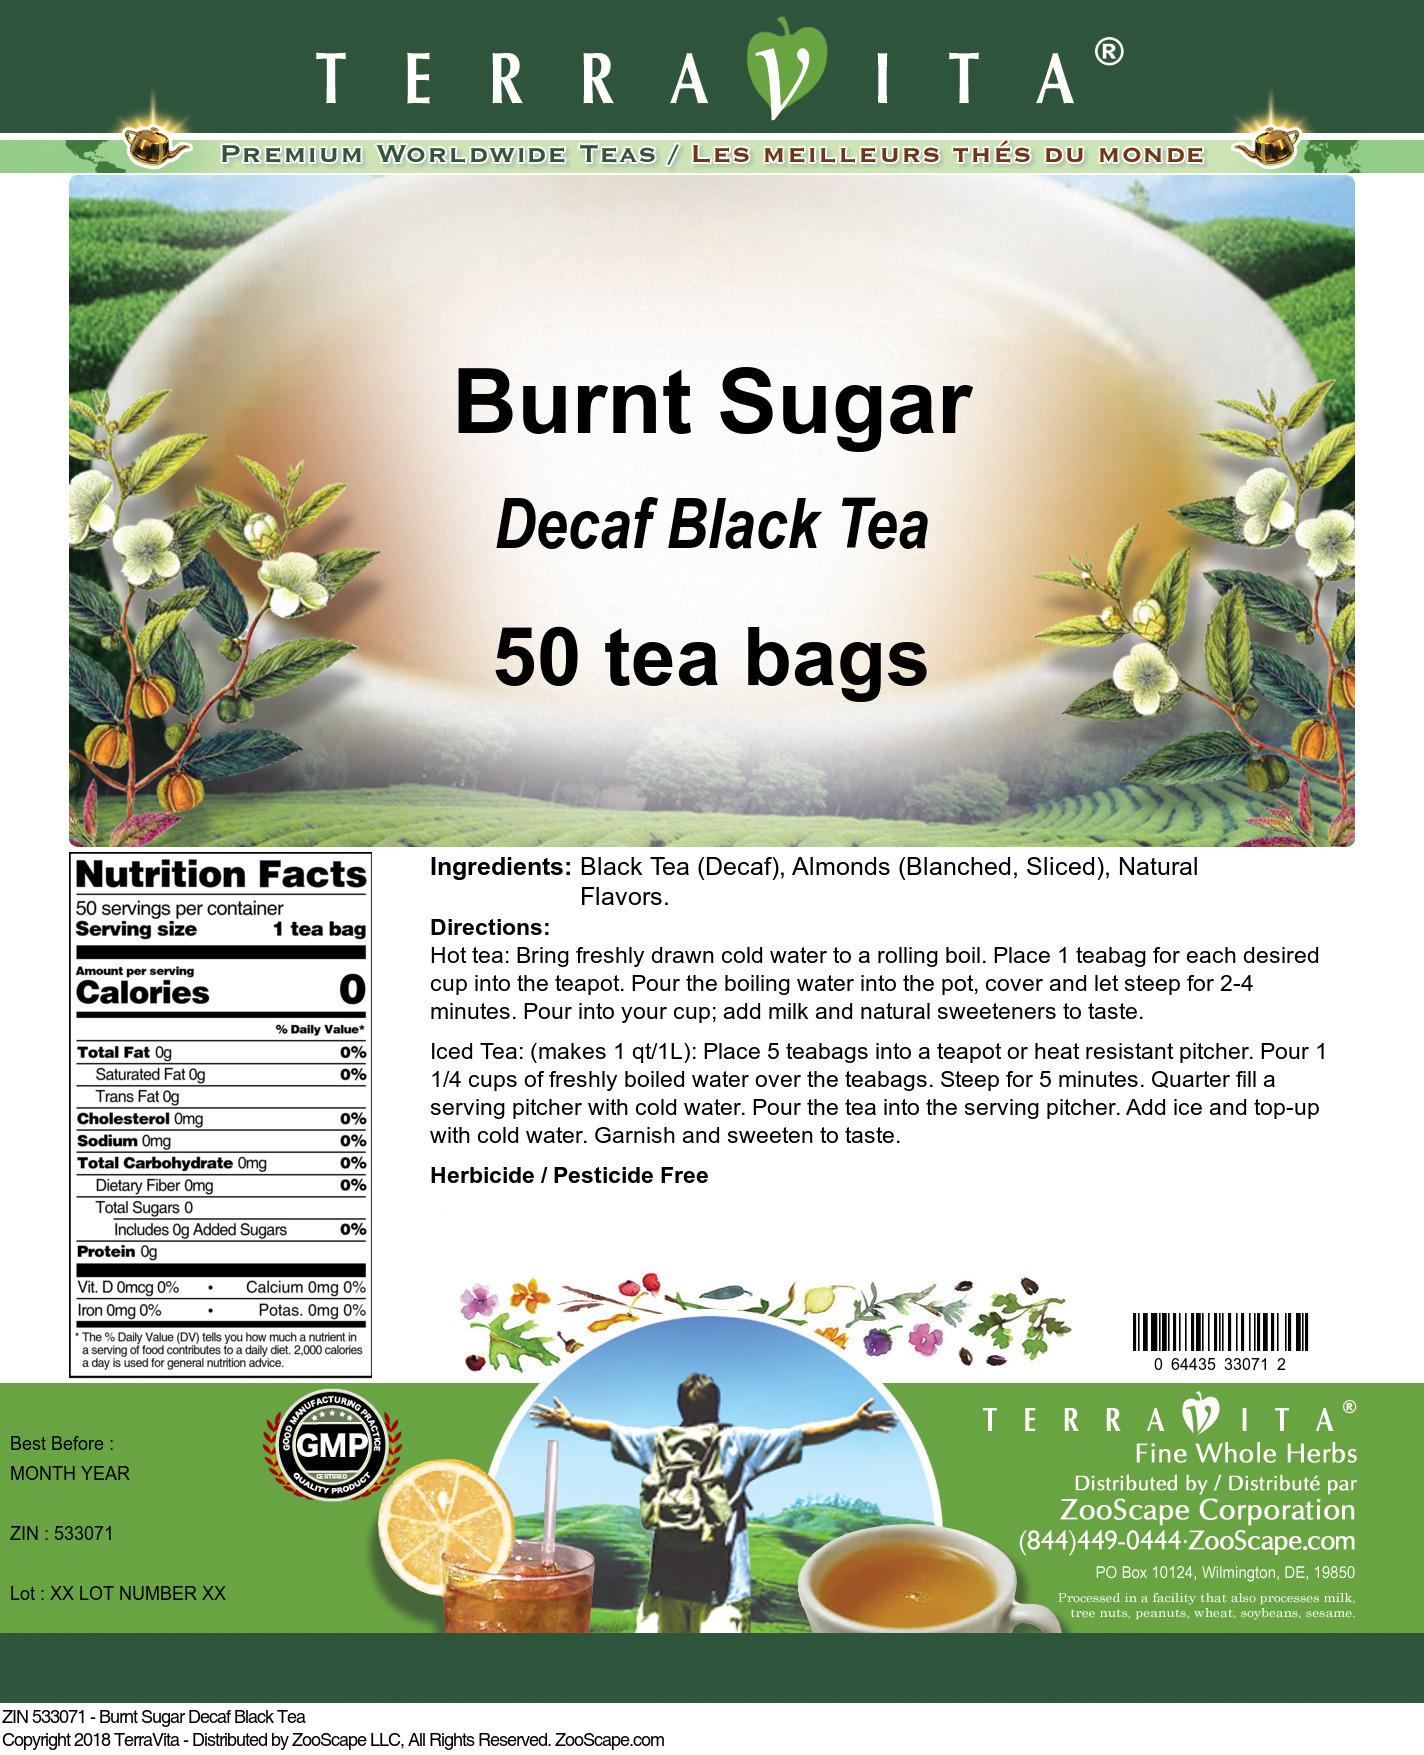 Burnt Sugar Decaf Black Tea